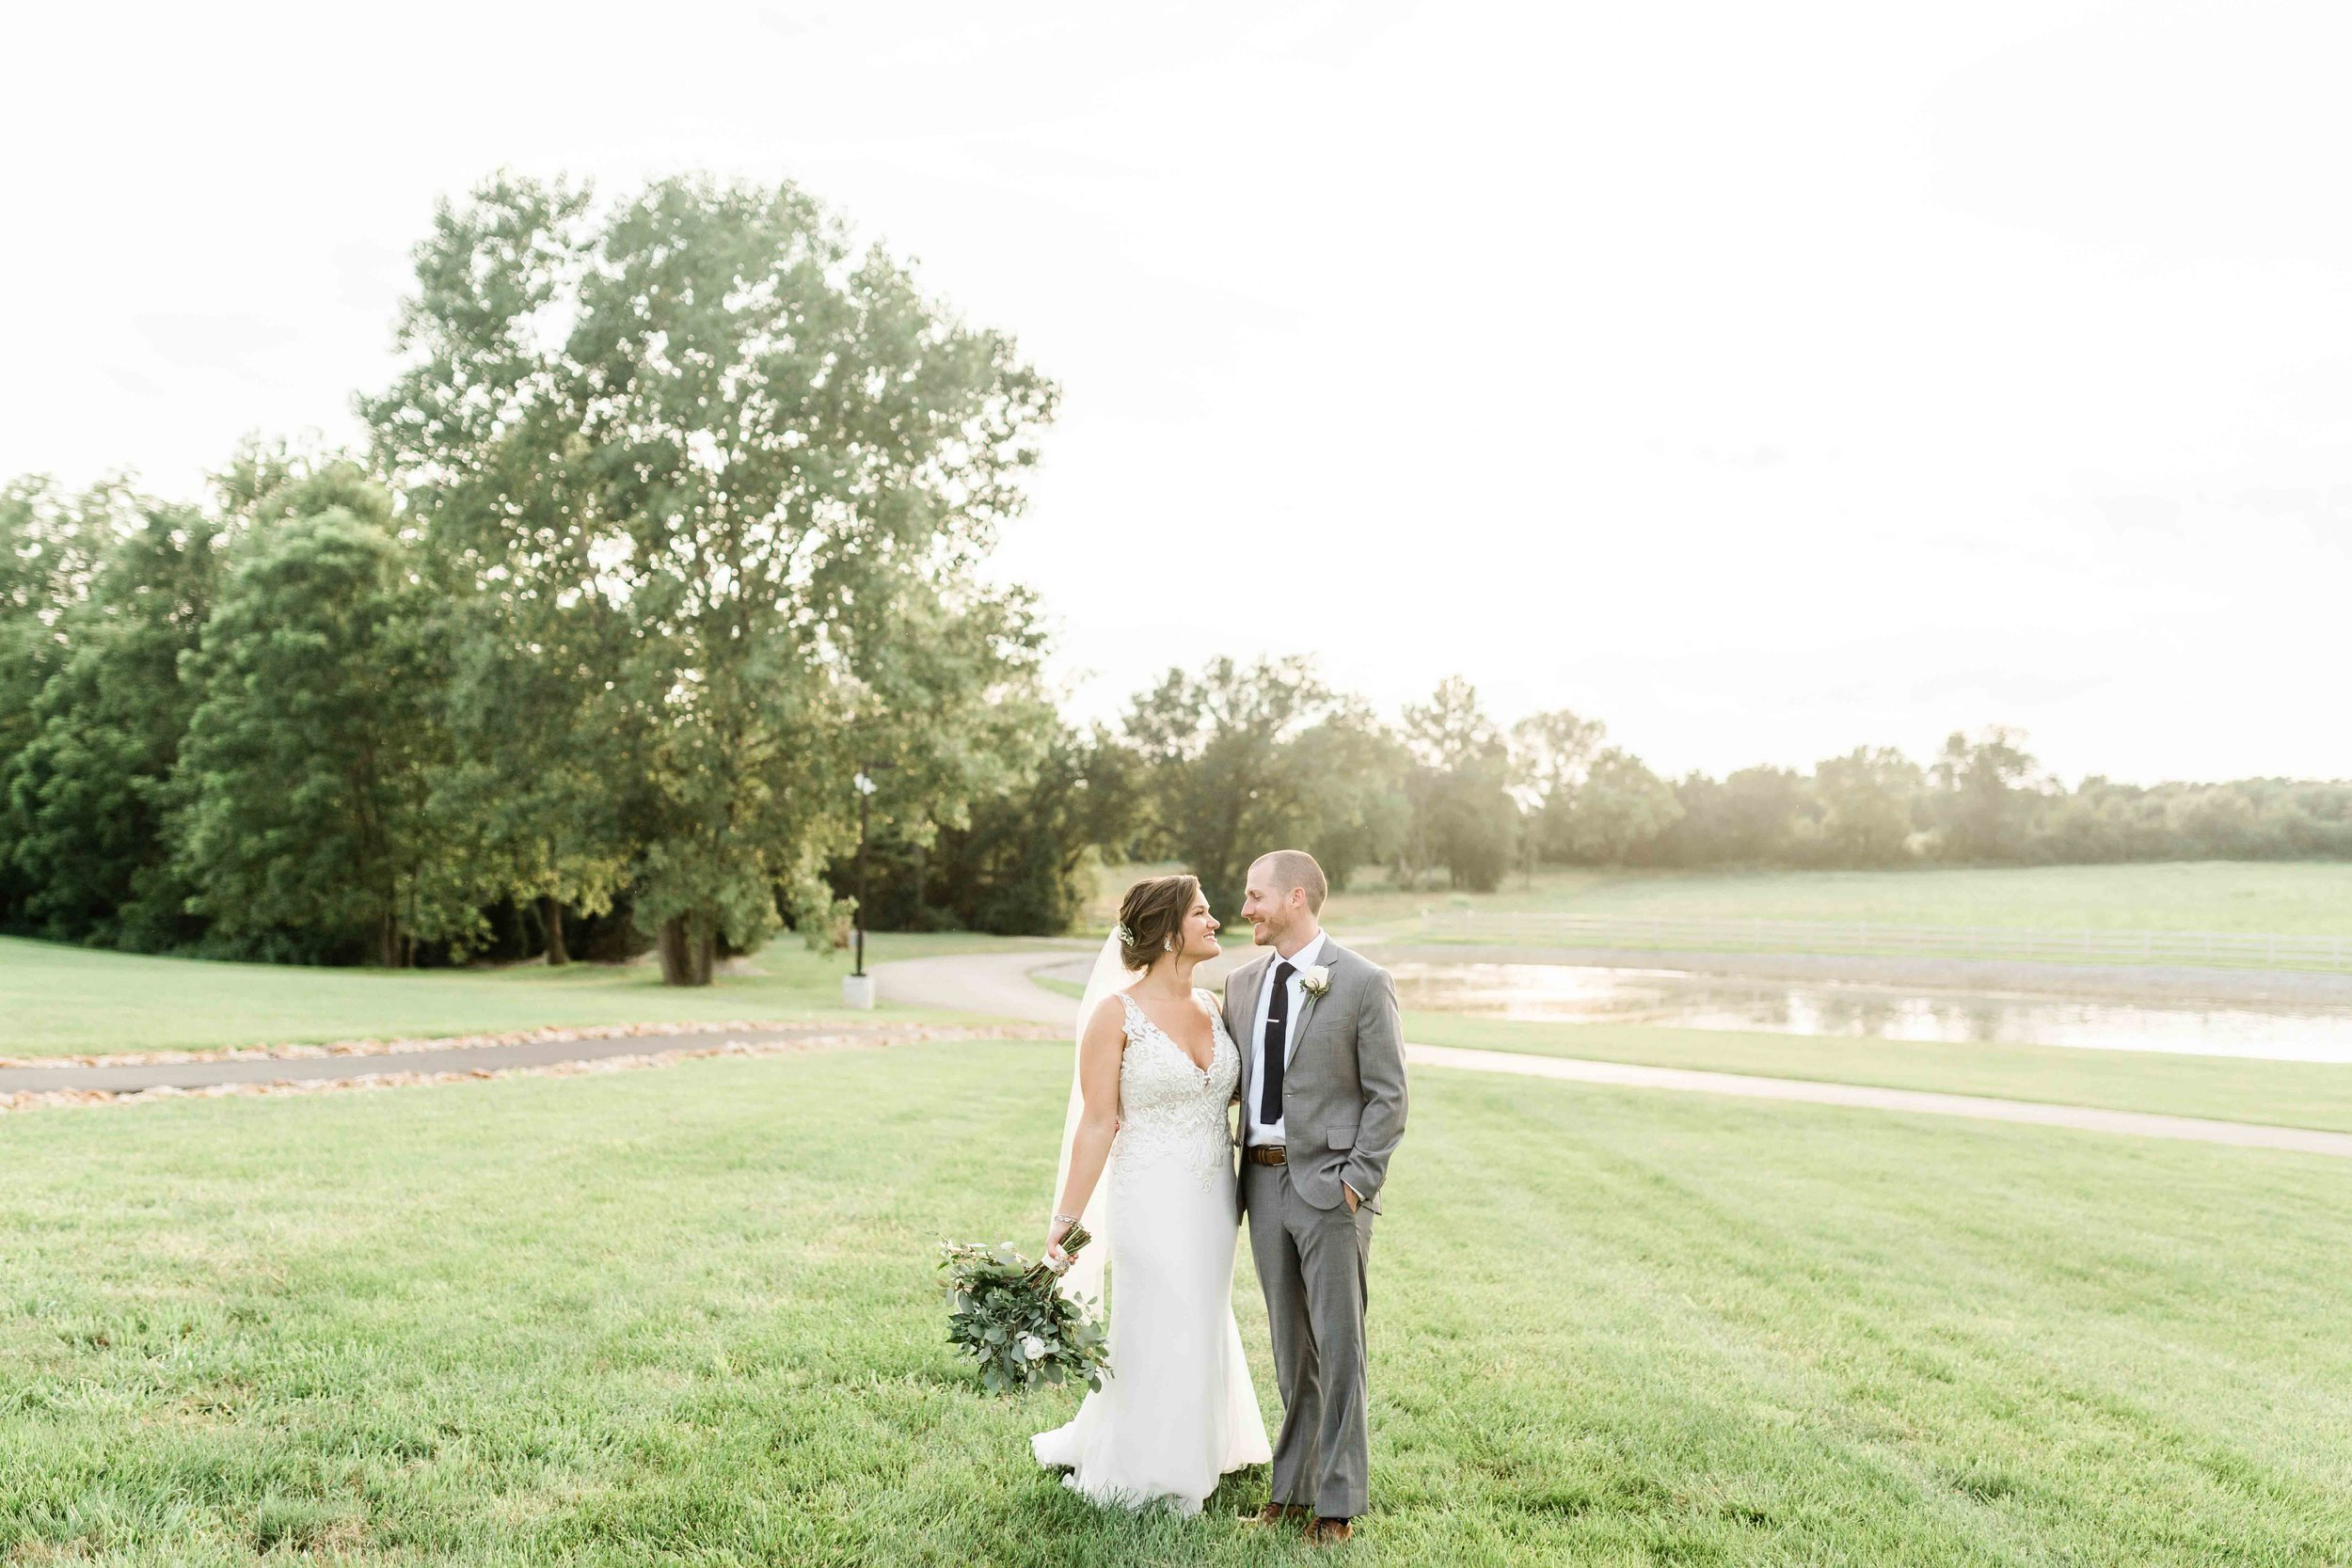 light and airy wedding photographers cincinnati ohio-5.jpg